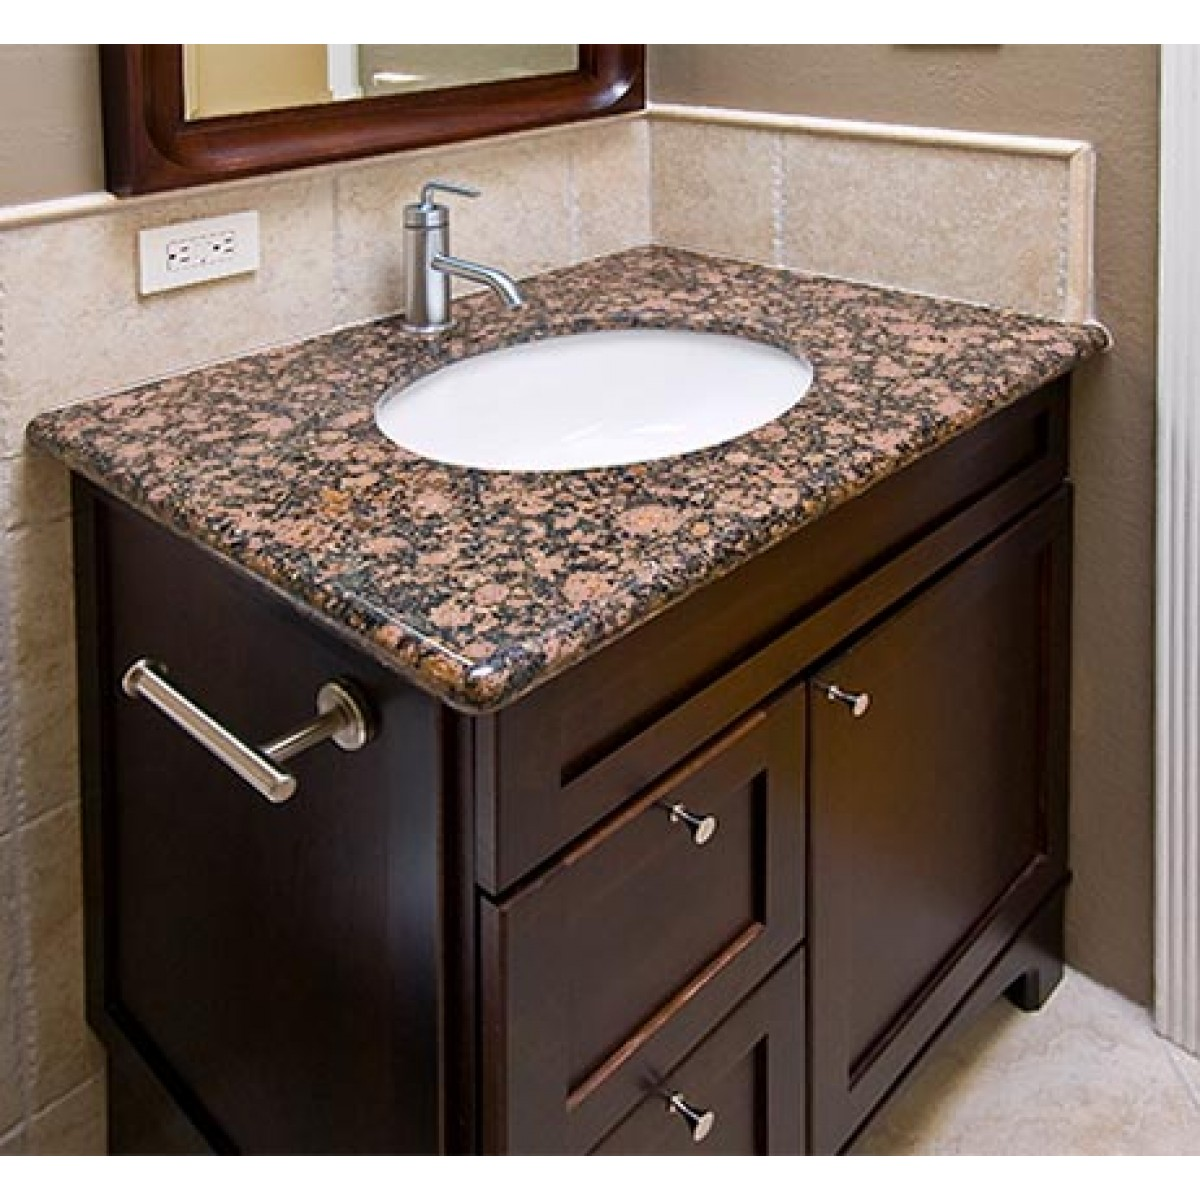 Bathroom Sink 19 X 17 biscuit porcelain ceramic vanity undermount bathroom vessel sink